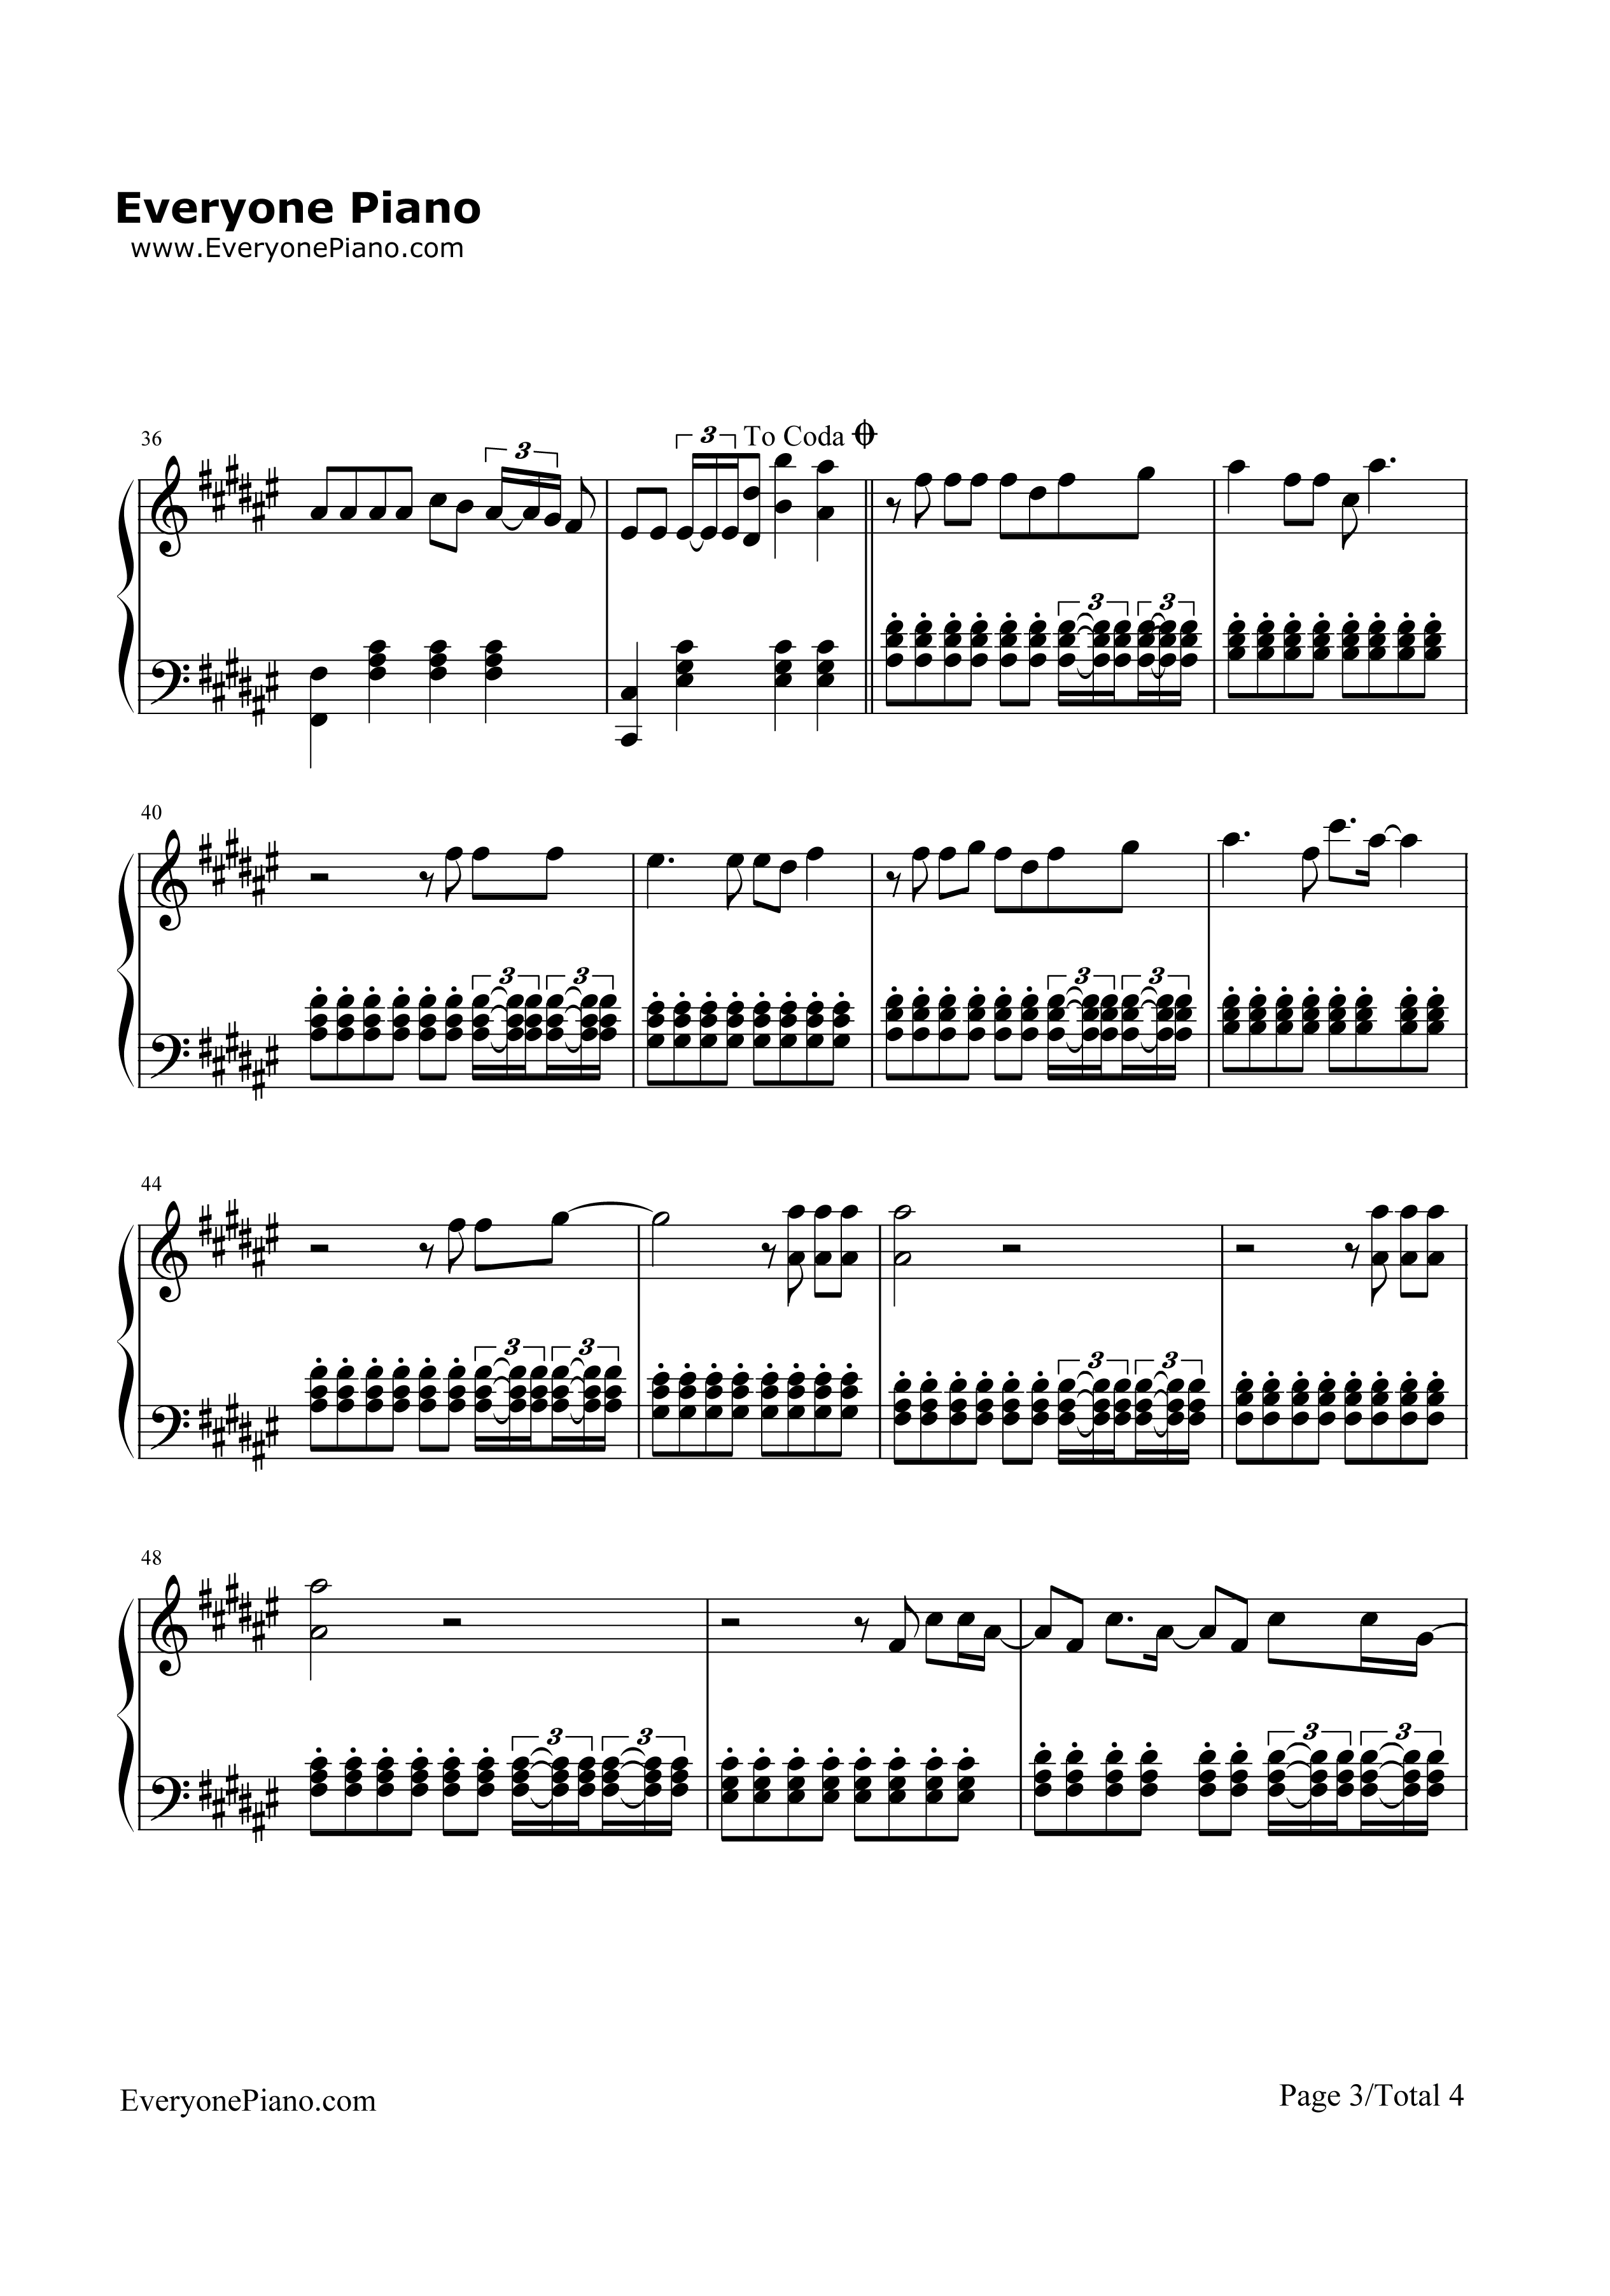 钢琴曲谱 流行 faded-alan walker三声部 faded-alan walker三声部